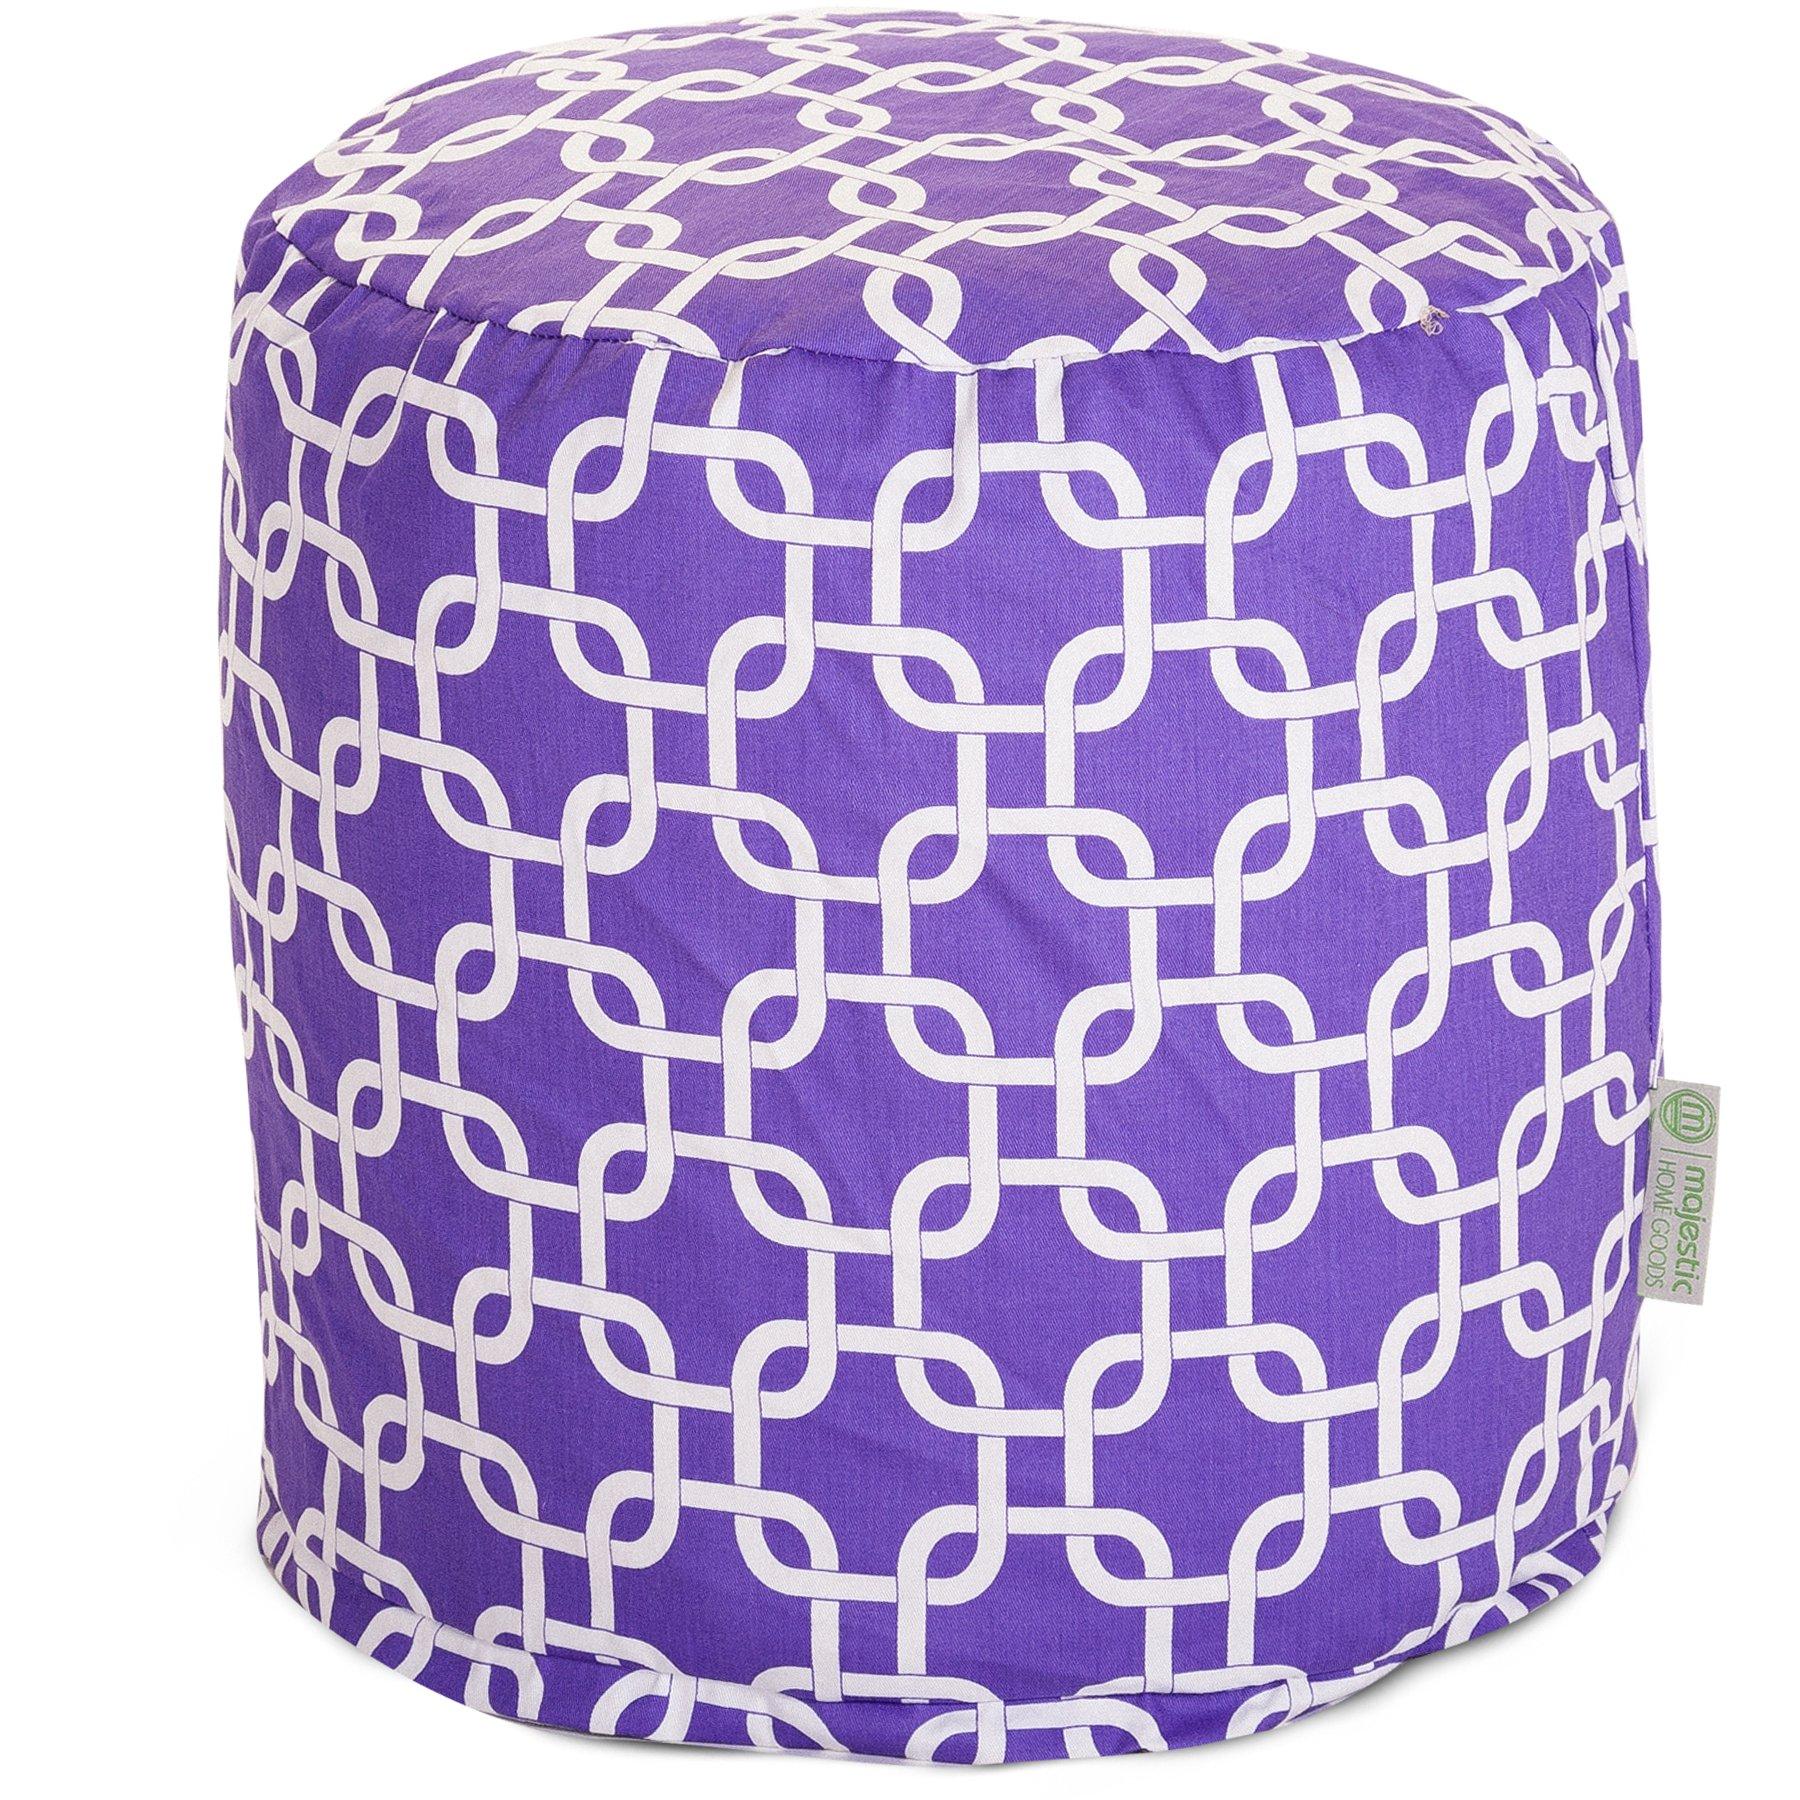 Majestic Home Goods Purple Links Small Pouf